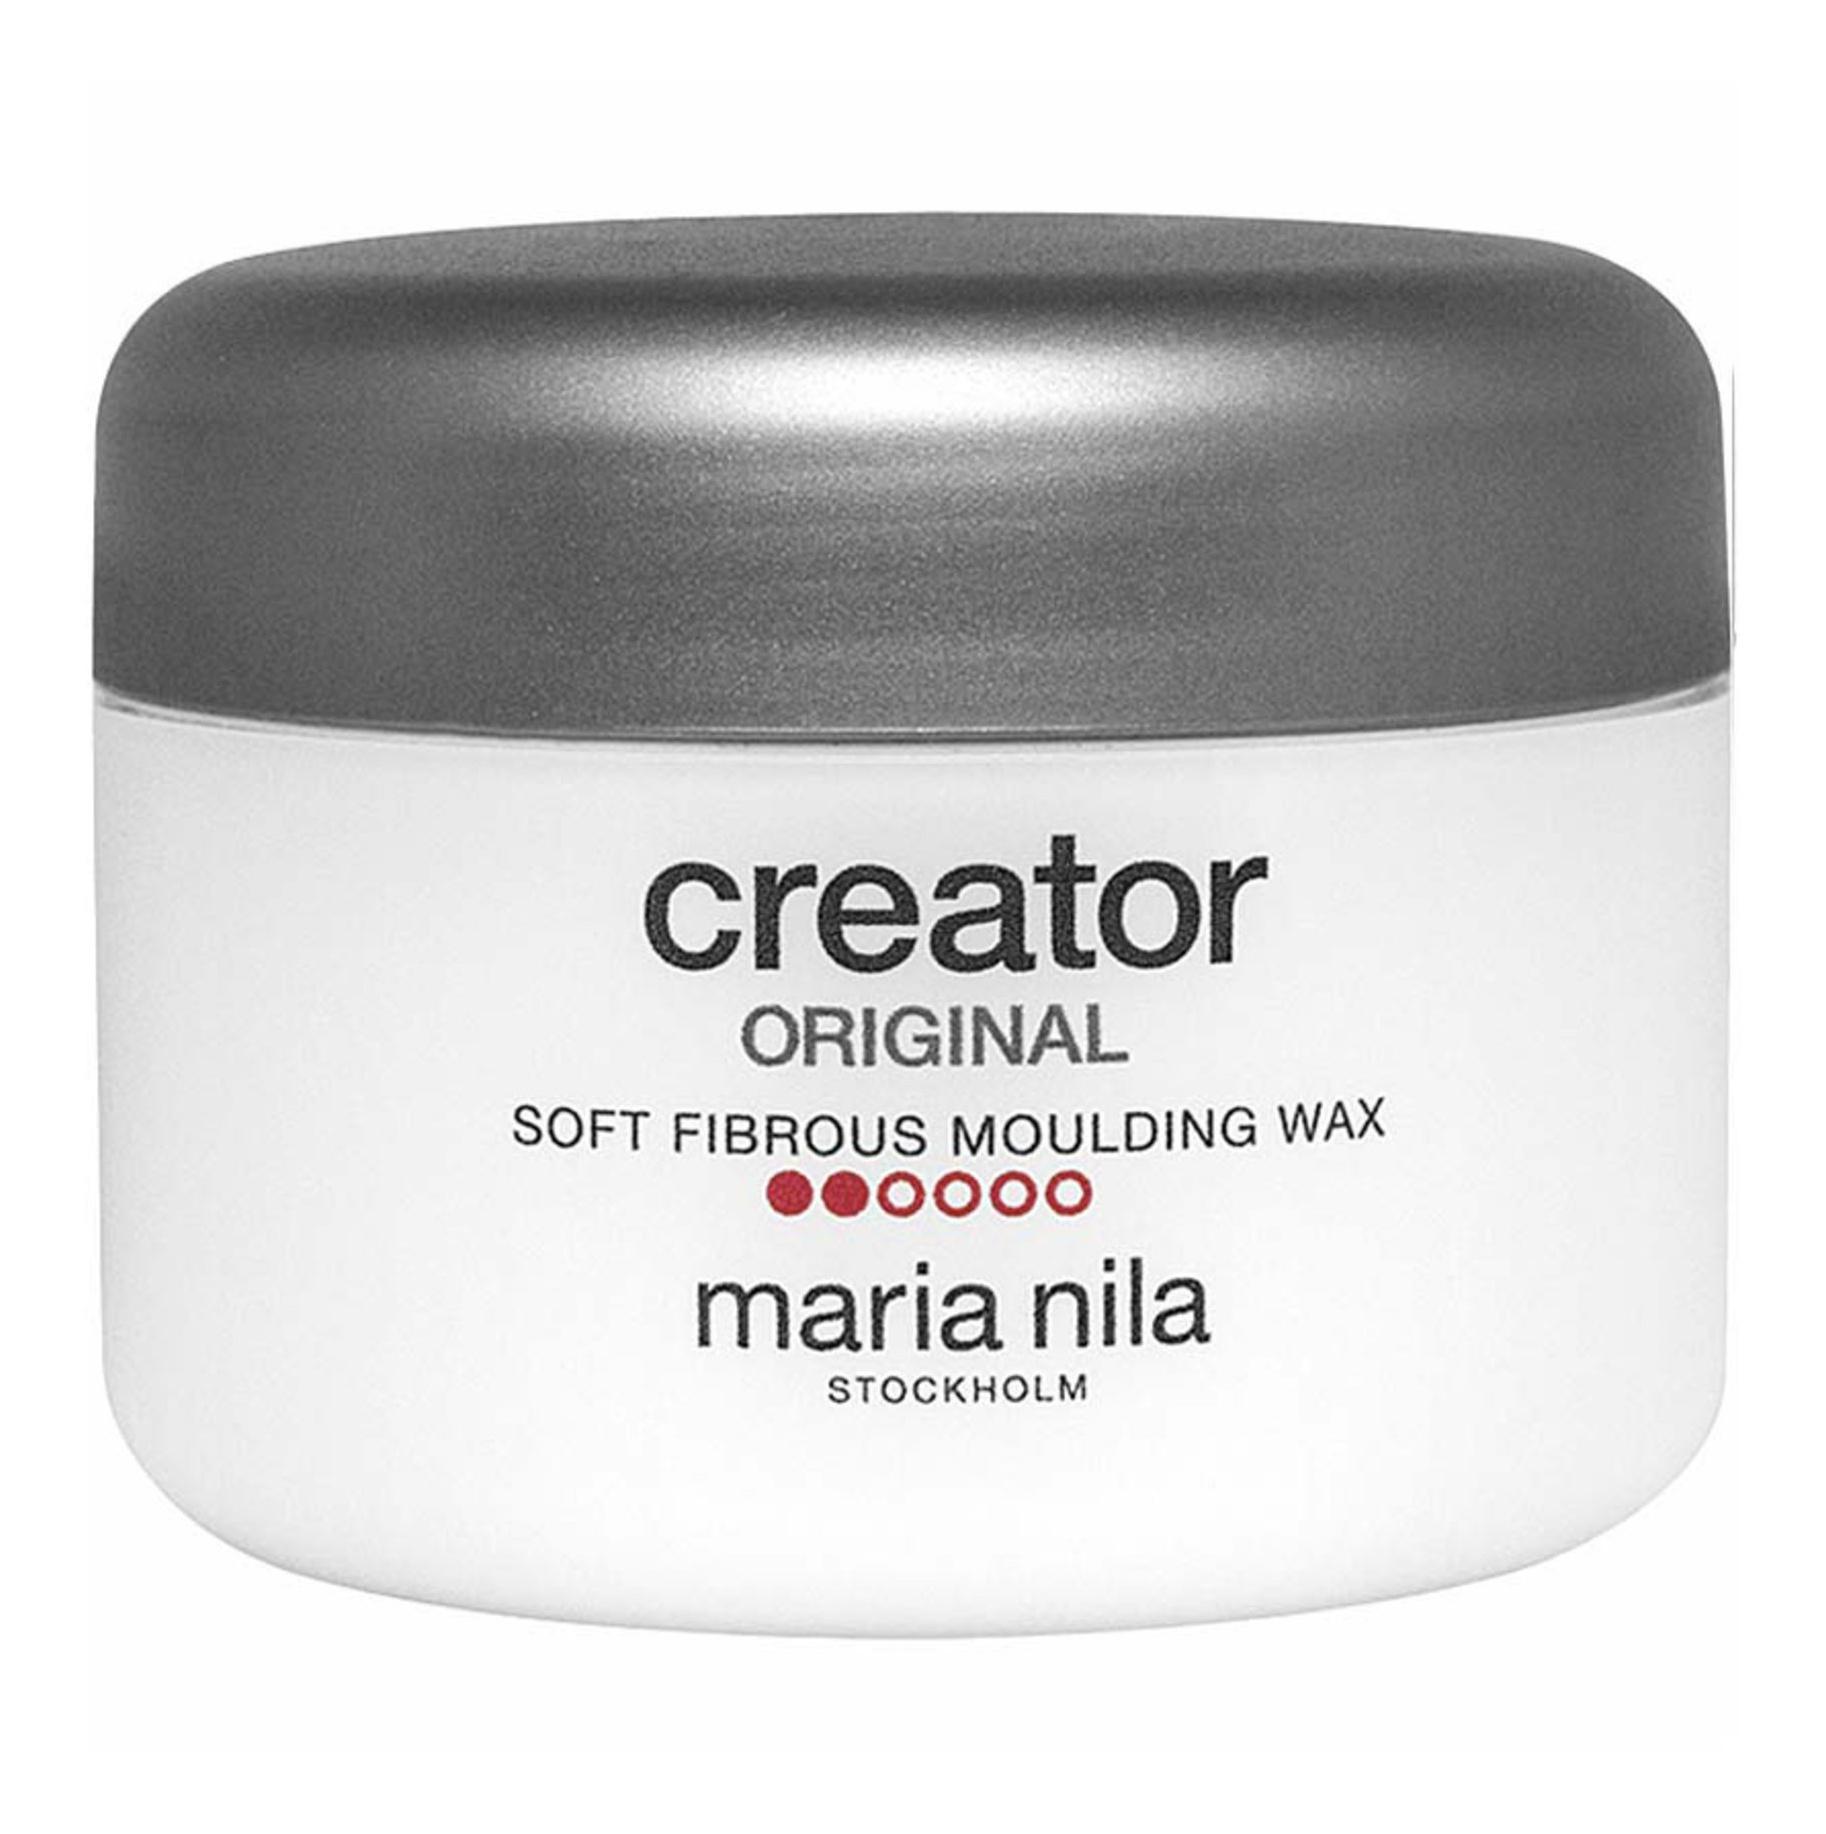 Creator Soft fibrous moulding wax